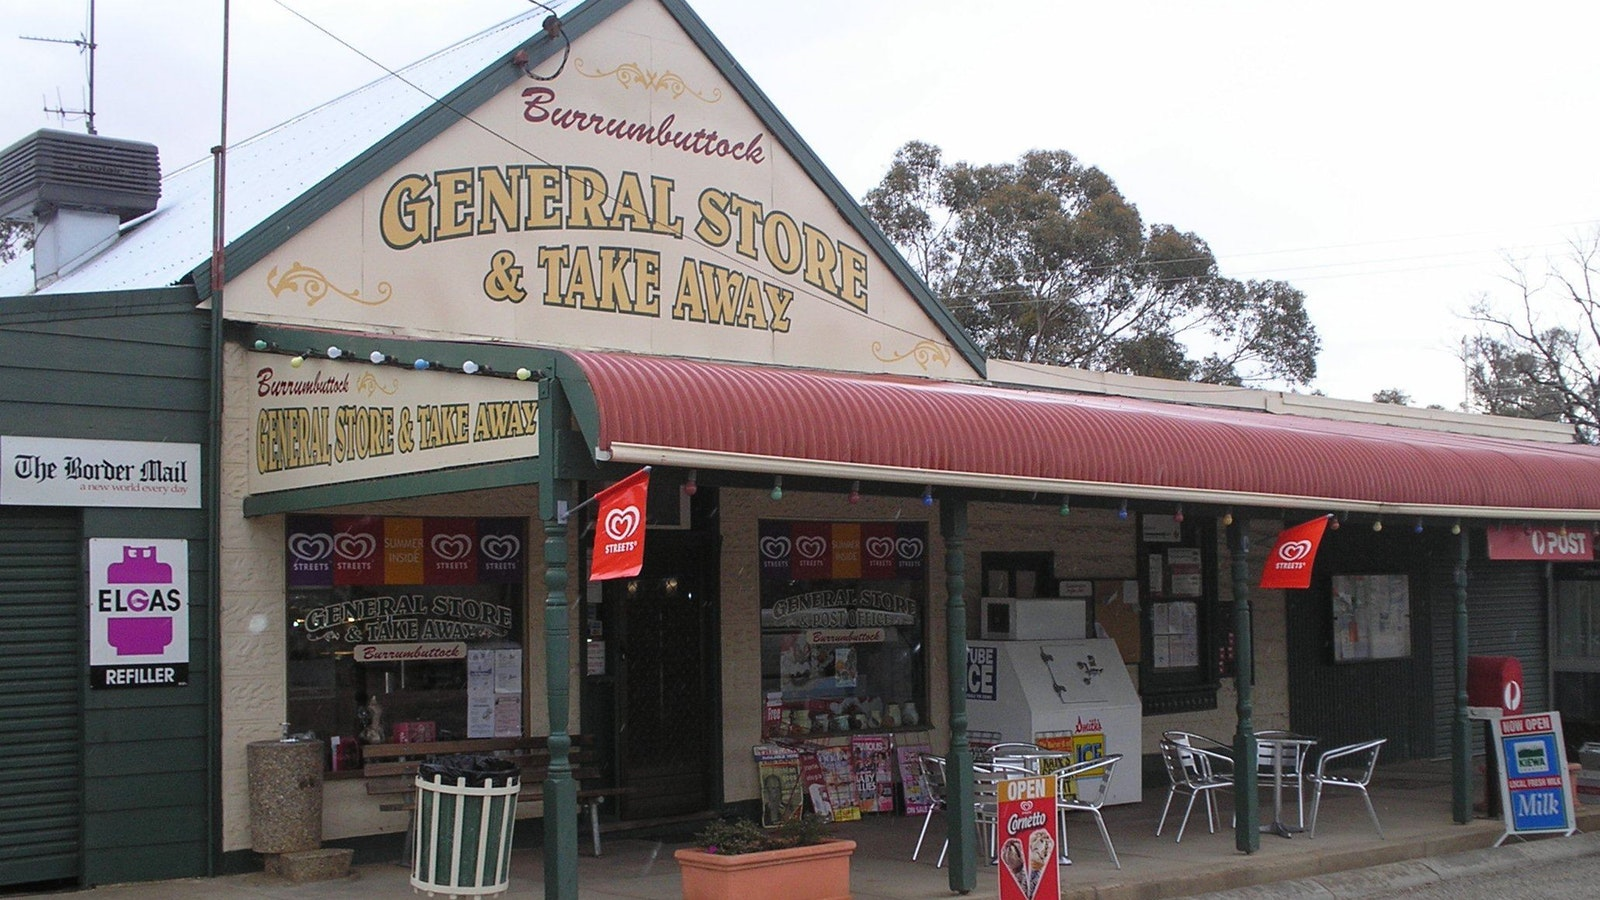 Burrumbuttock General Store